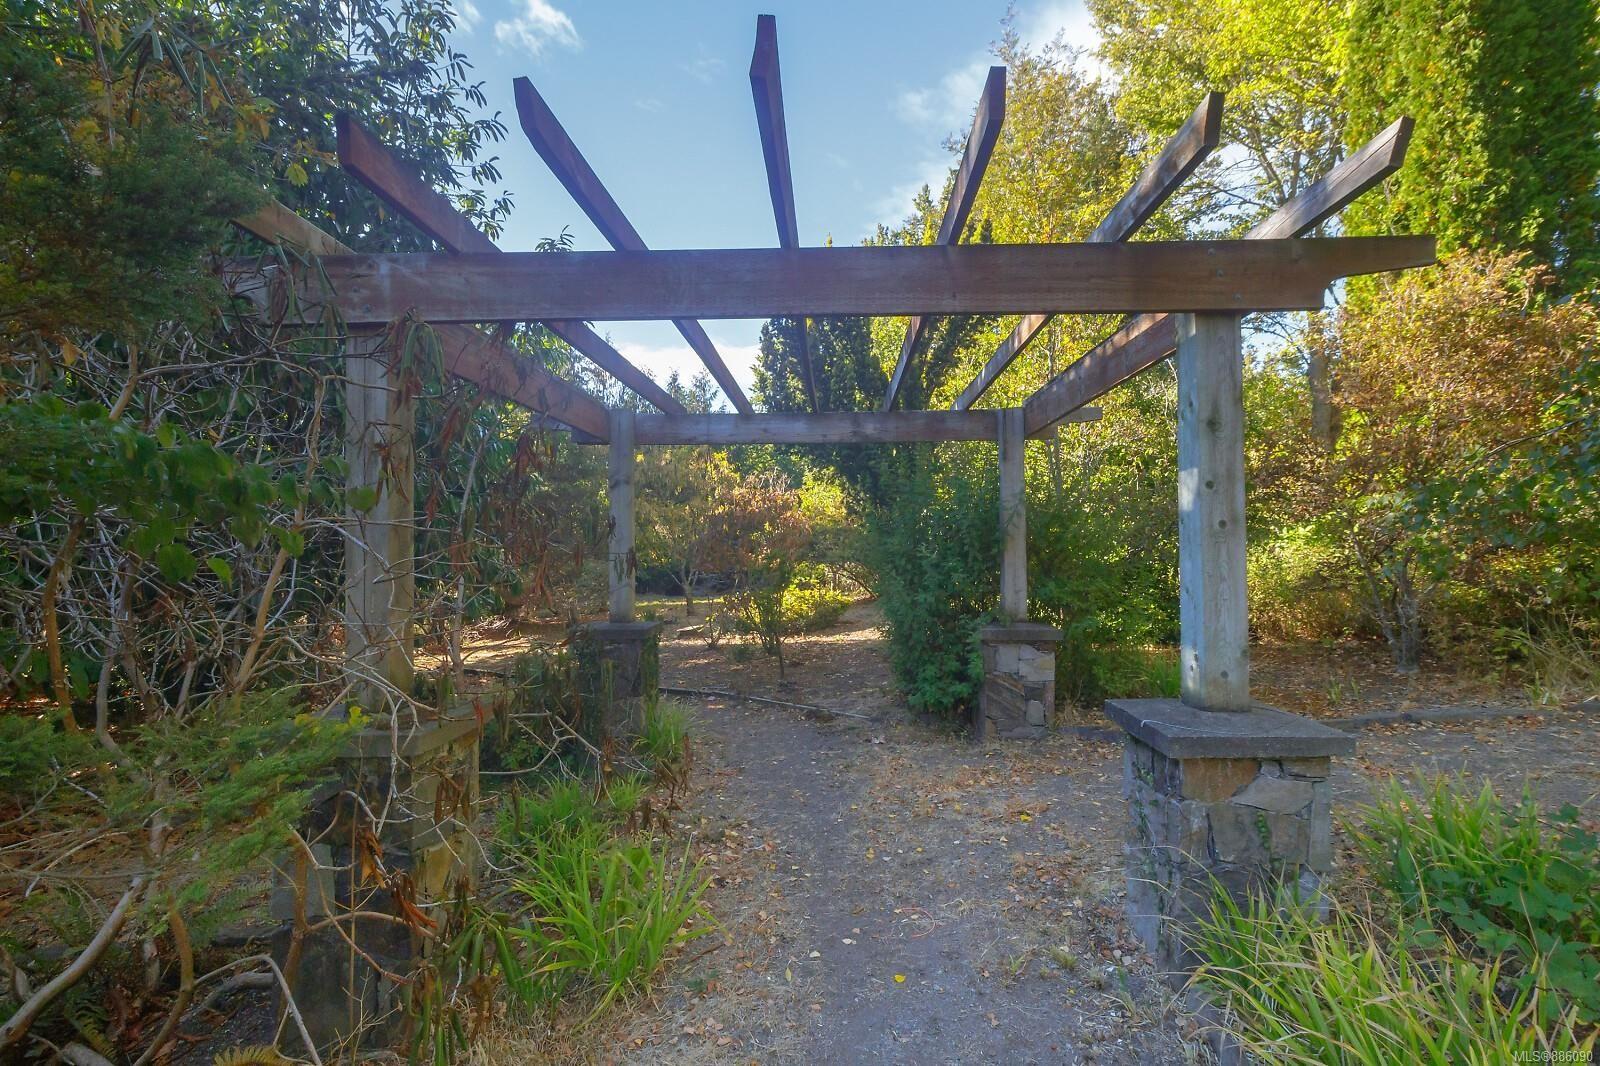 Photo 36: Photos: 4553 Blenkinsop Rd in : SE Blenkinsop House for sale (Saanich East)  : MLS®# 886090